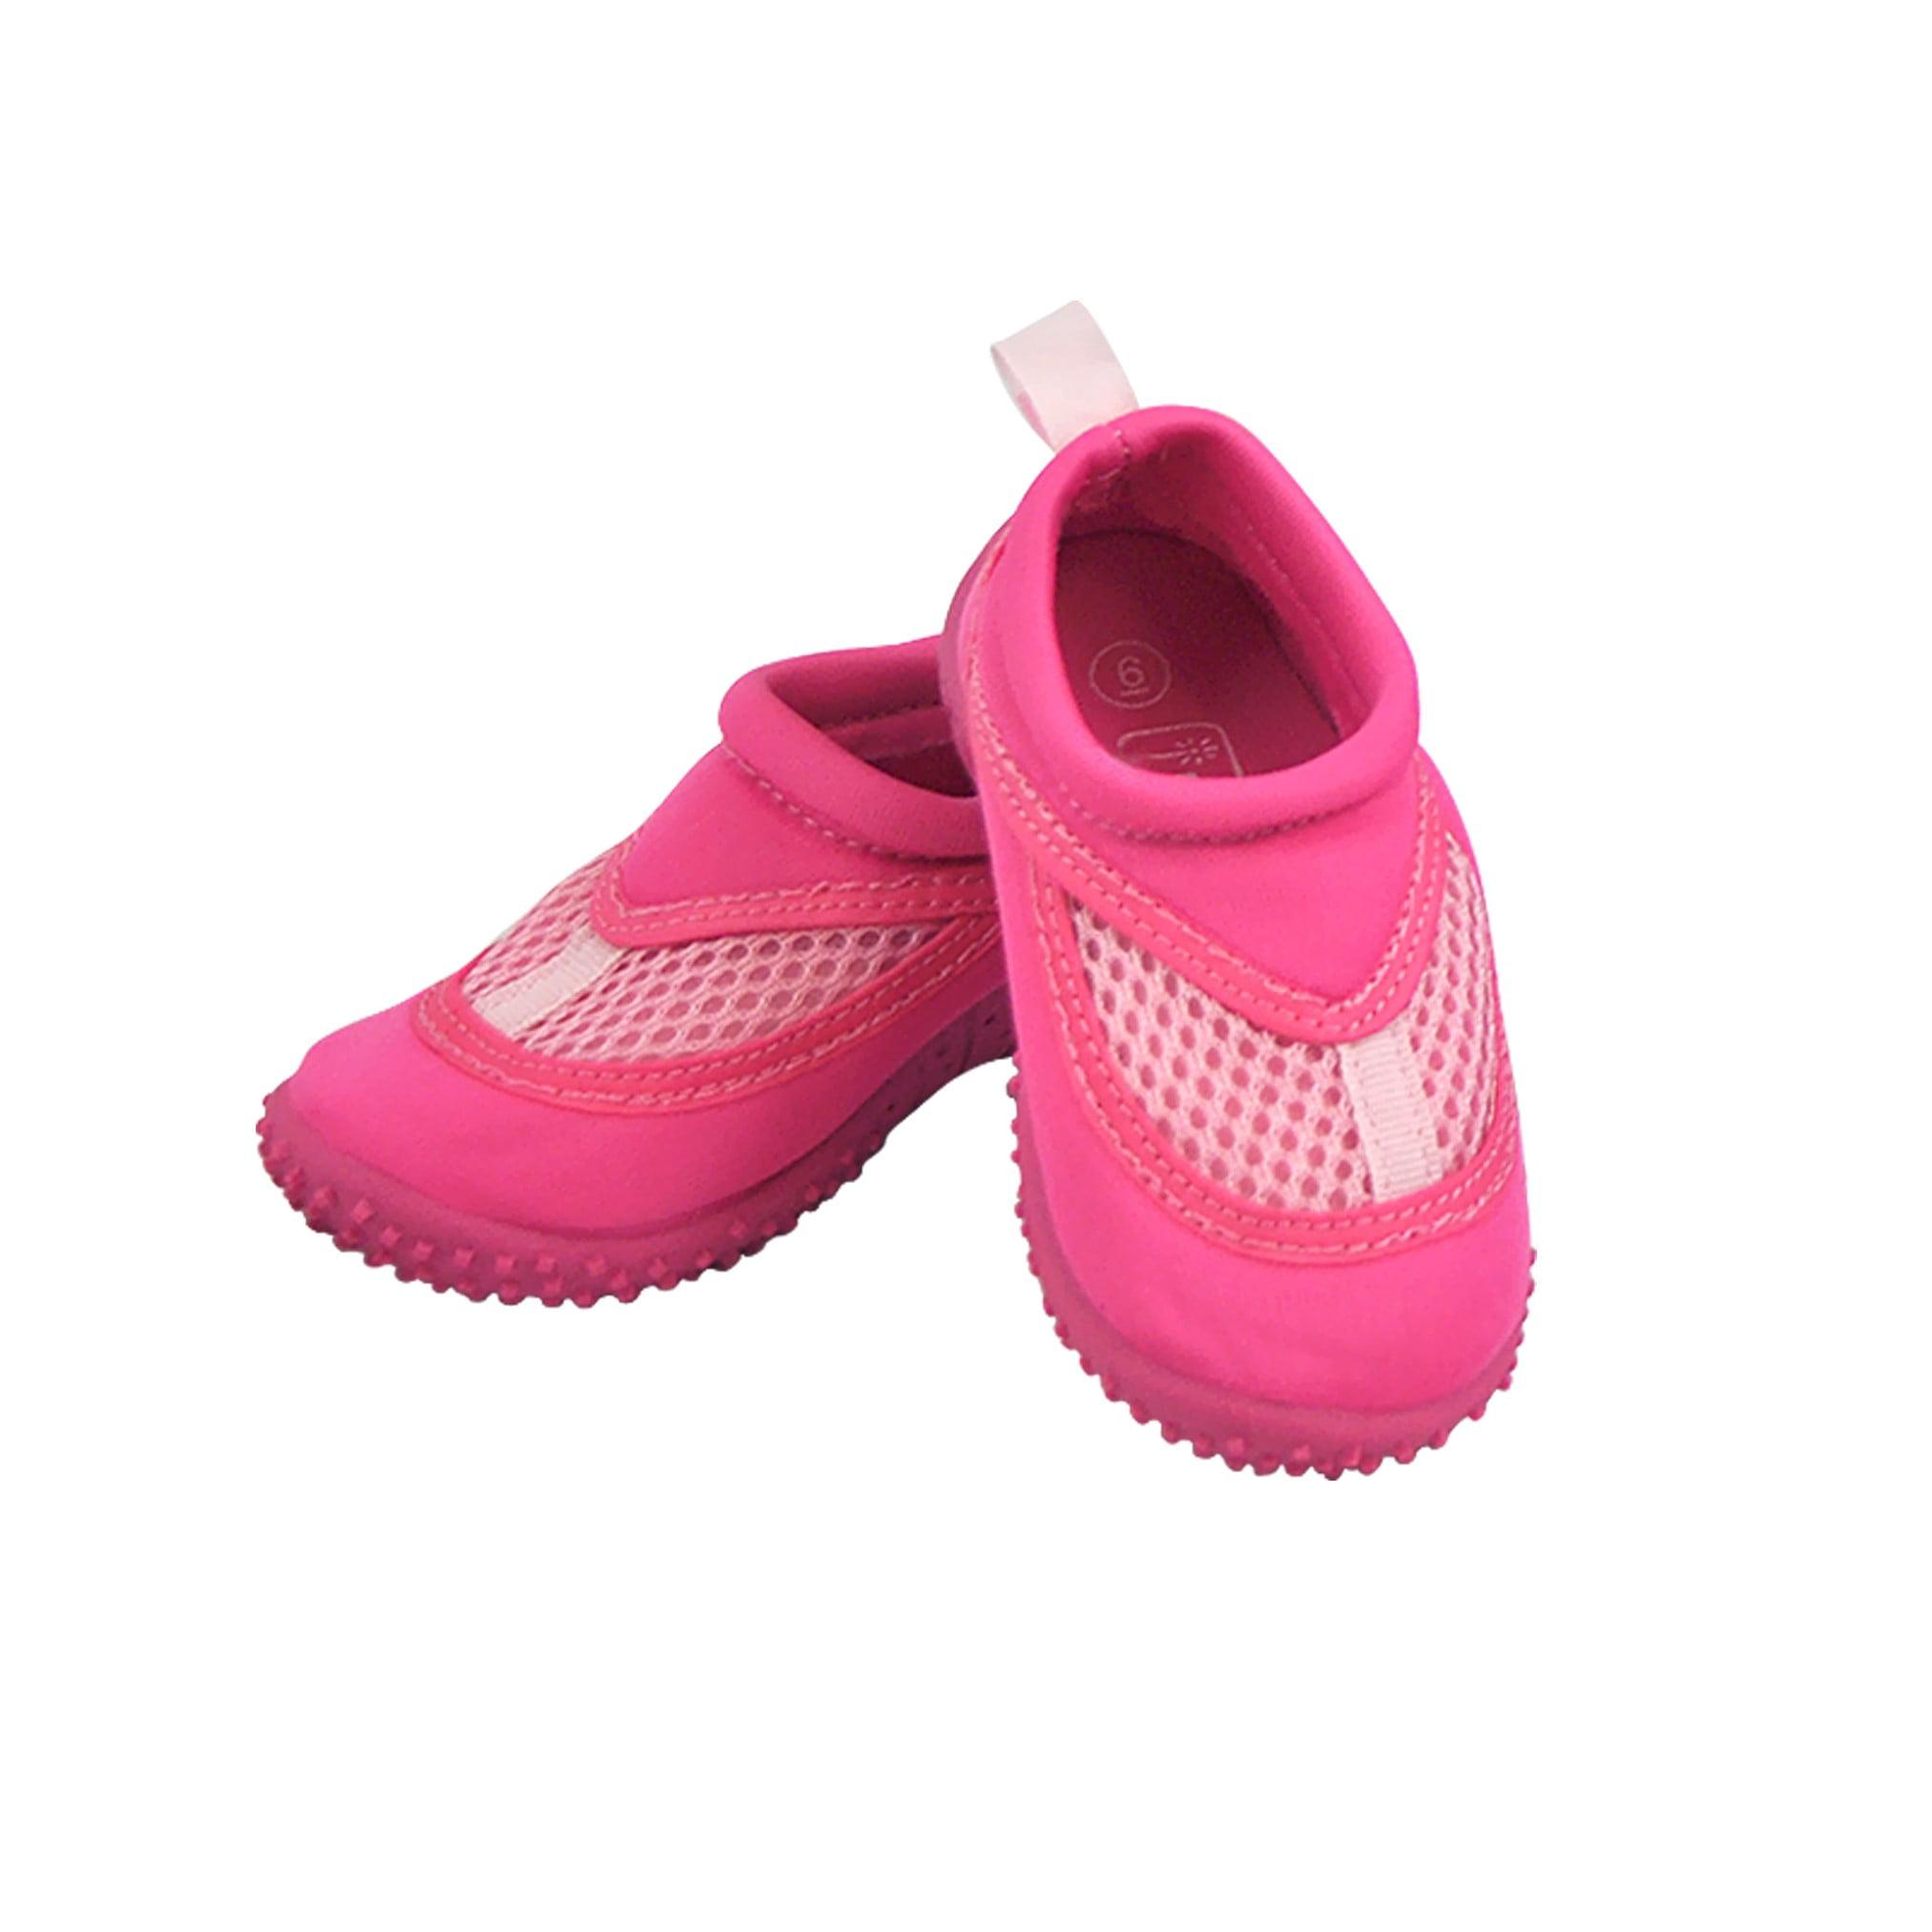 i play. - Baby Girls' Water Shoes - Walmart.com - Walmart.com